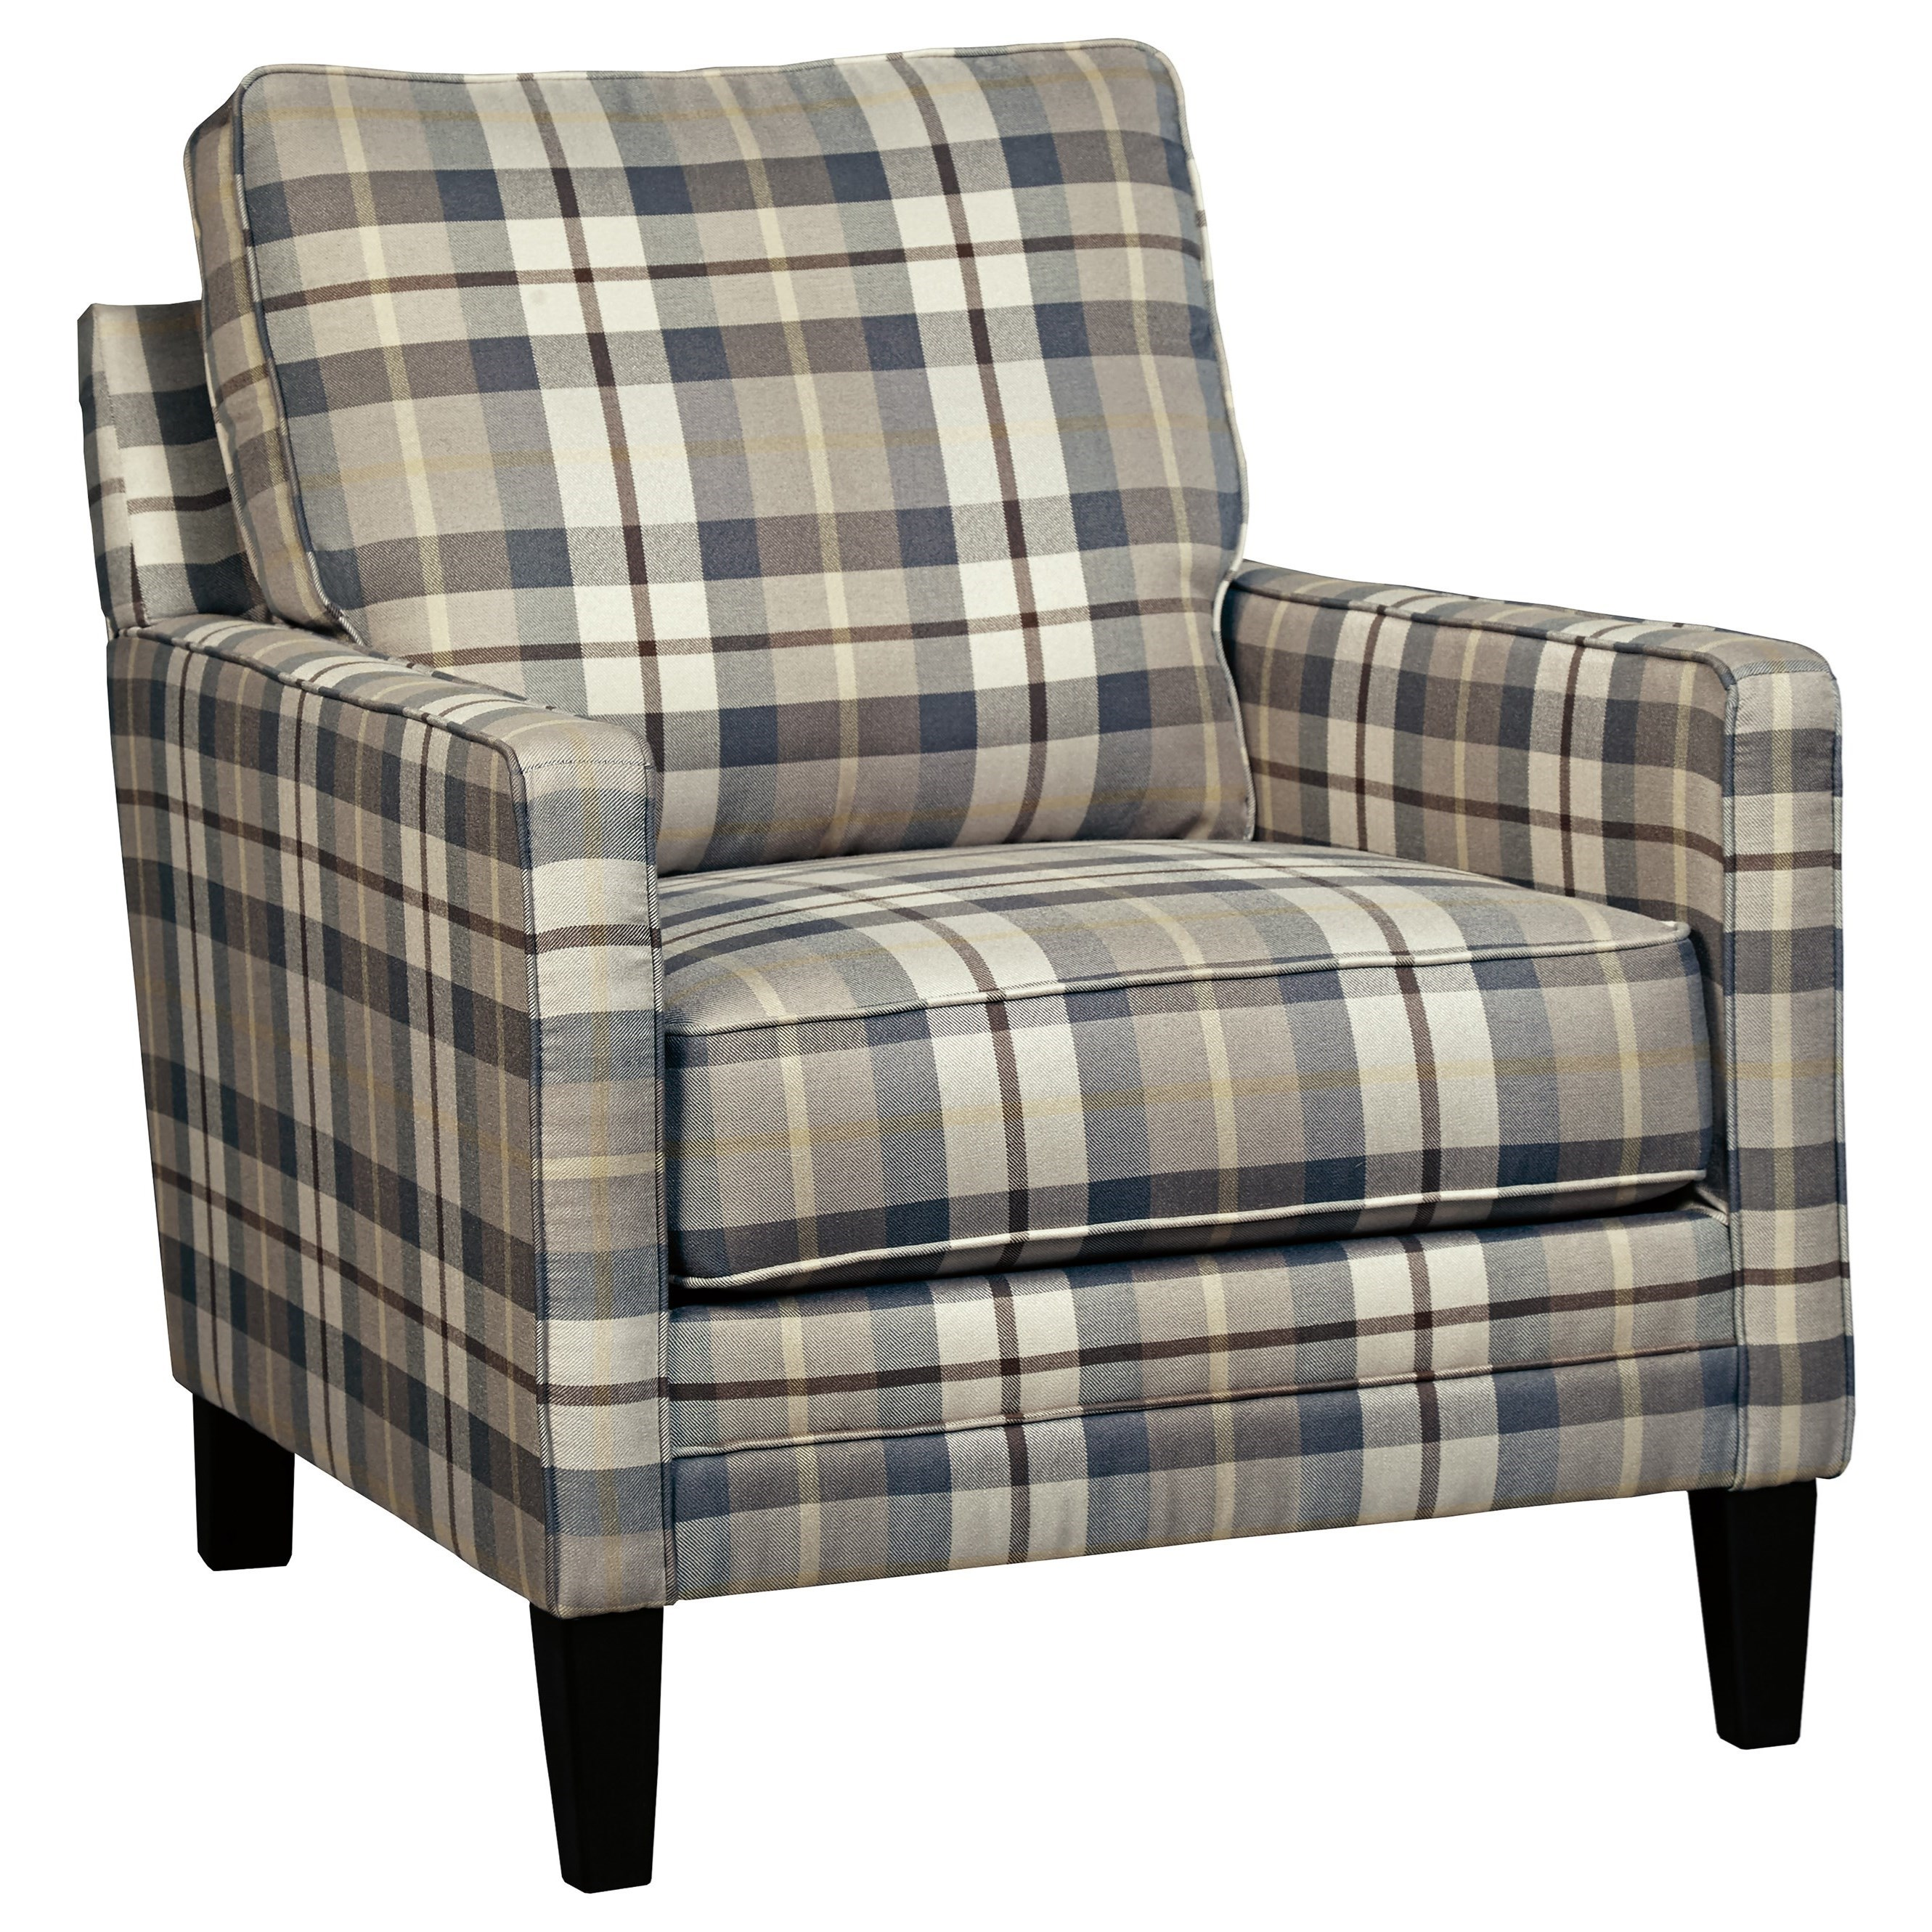 Millennium Austwell Accent Chair - Item Number: 5590121